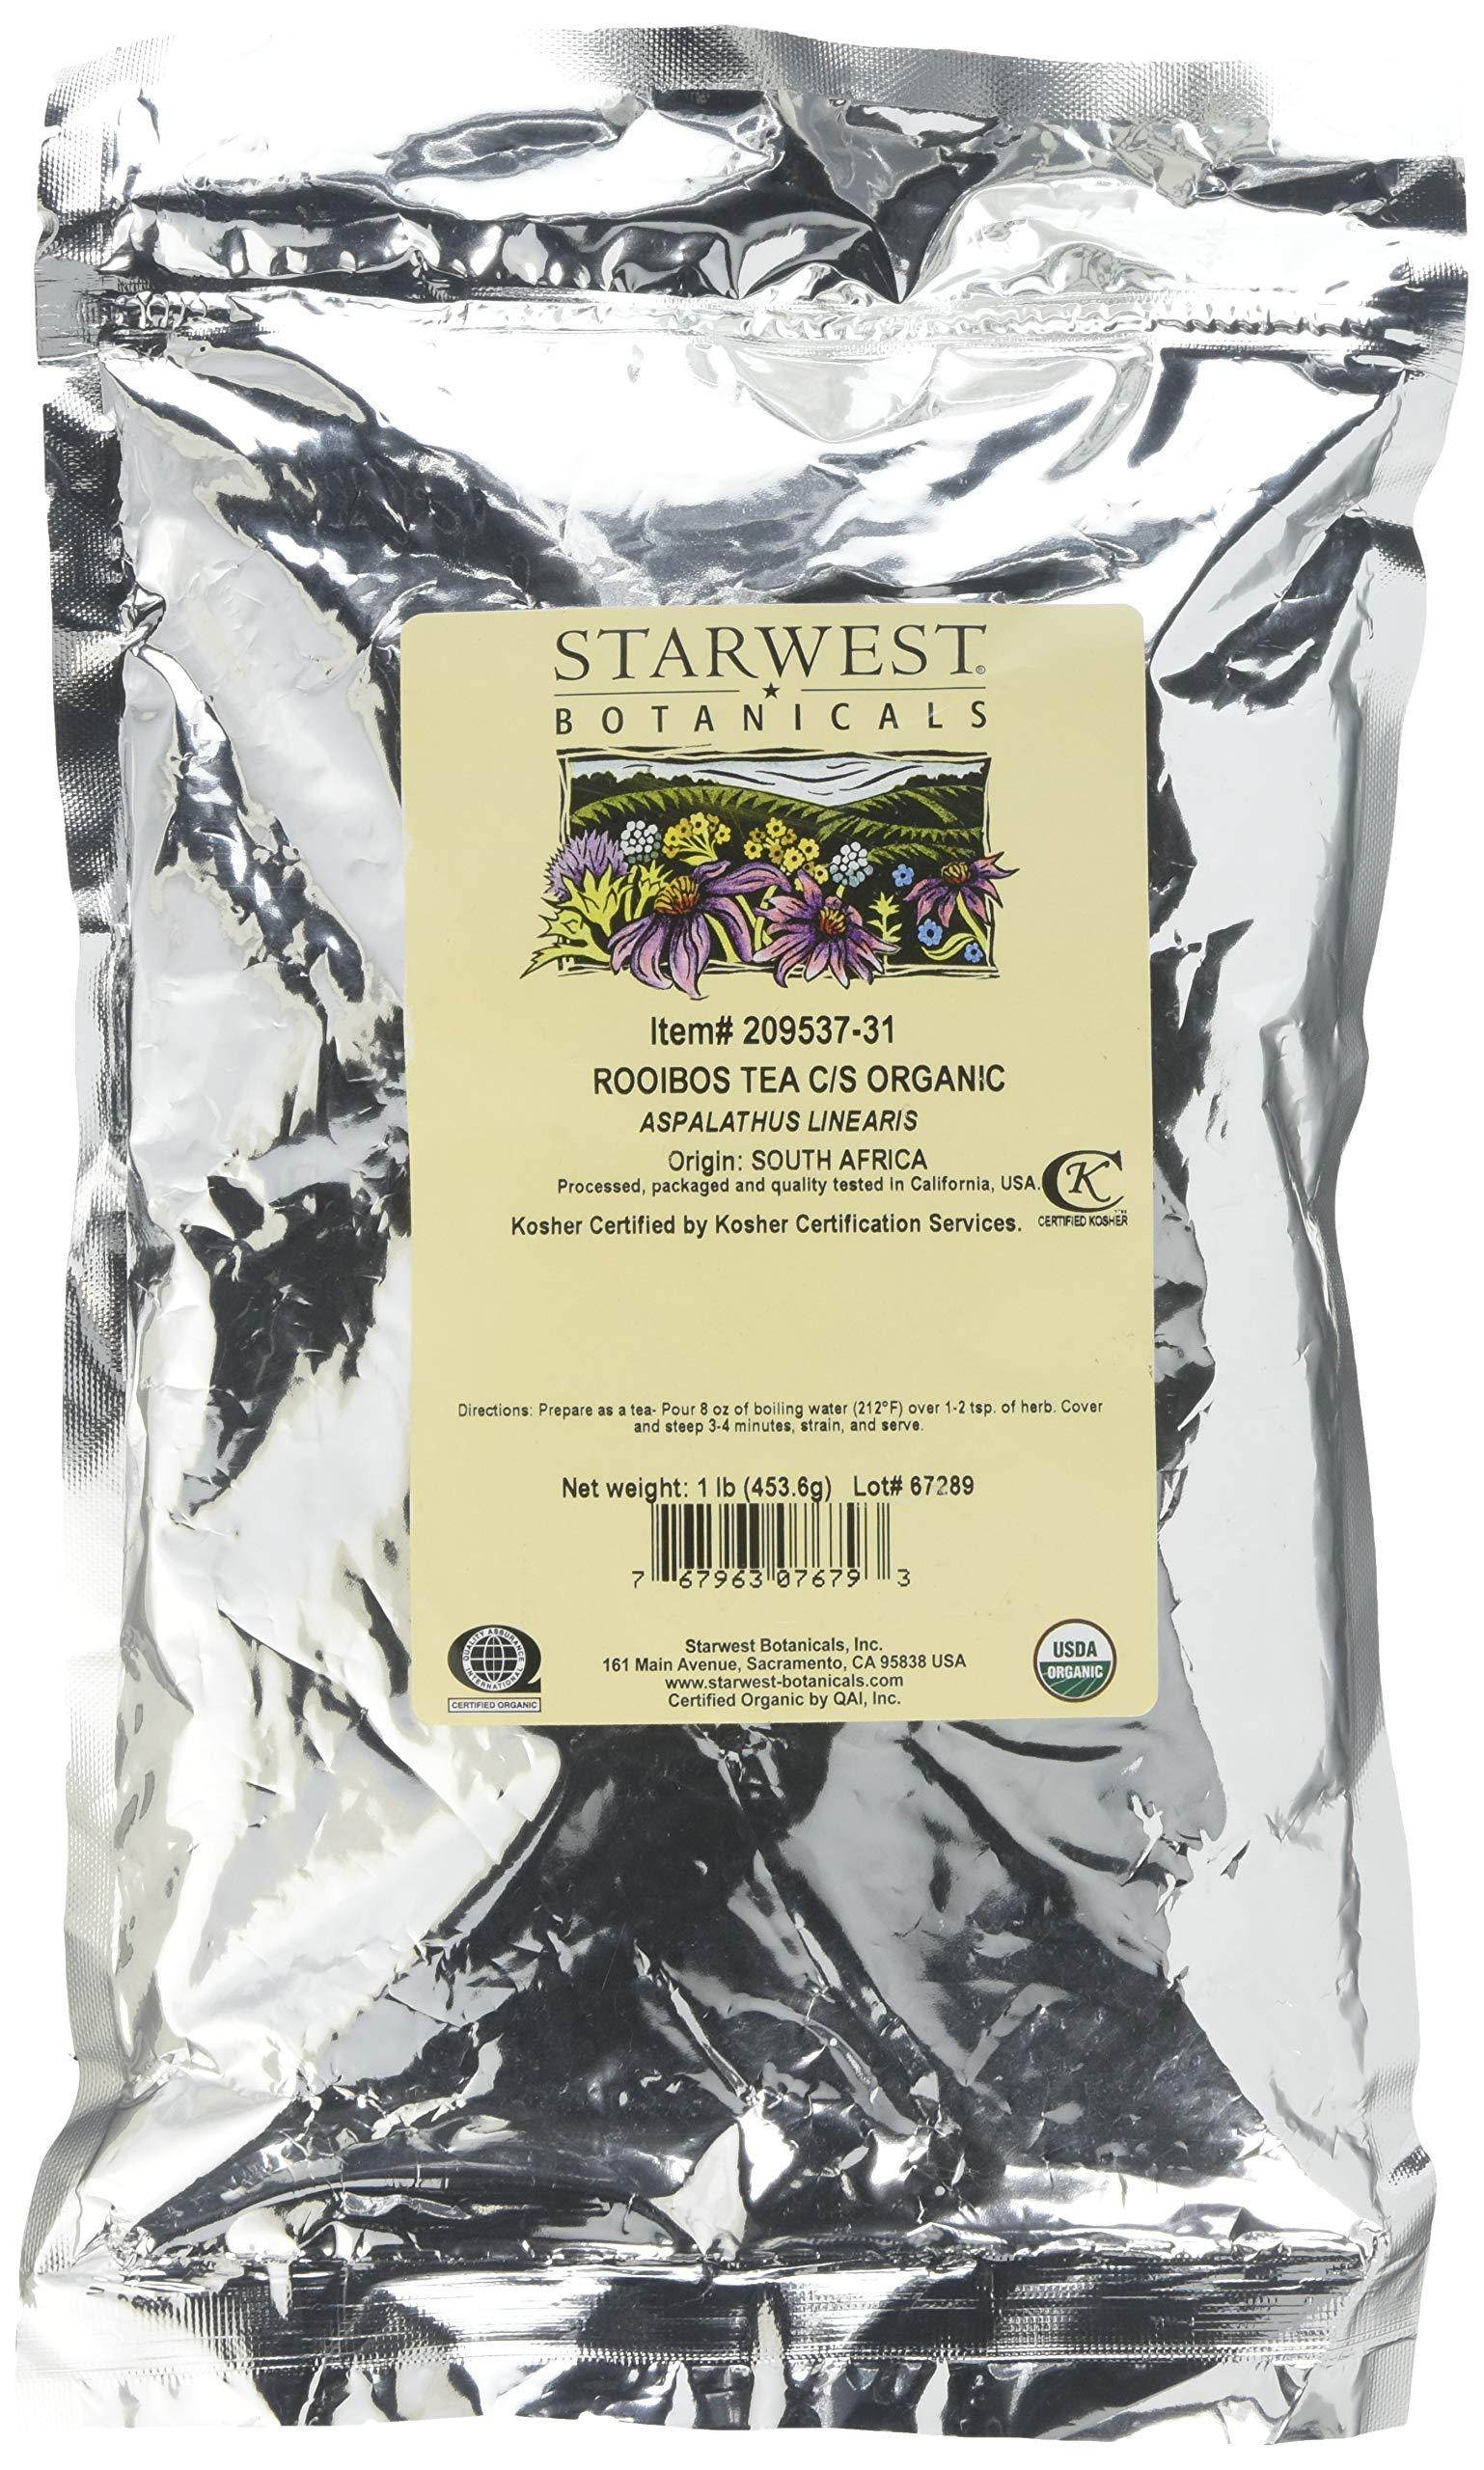 Starwest Botanicals C/S Organic Rooibos Tea, 2 Pound